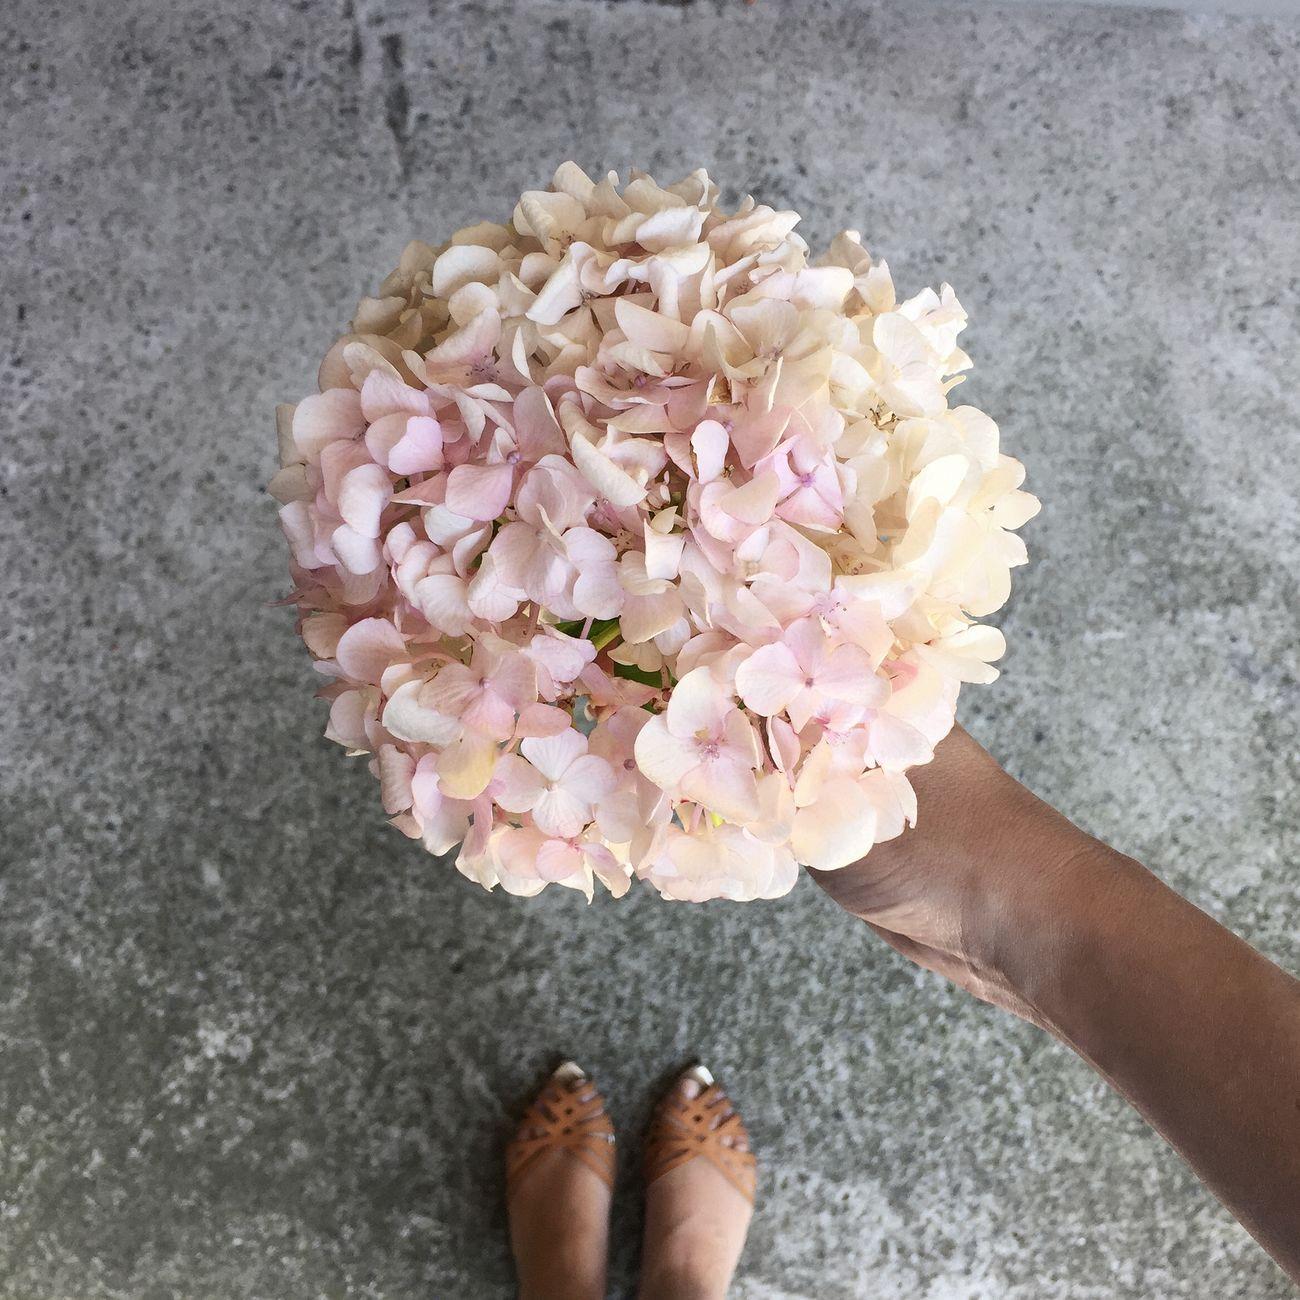 Photo-shoot aftermath. Flowers Taking Photos Hydrangea Flowerporn Bunch